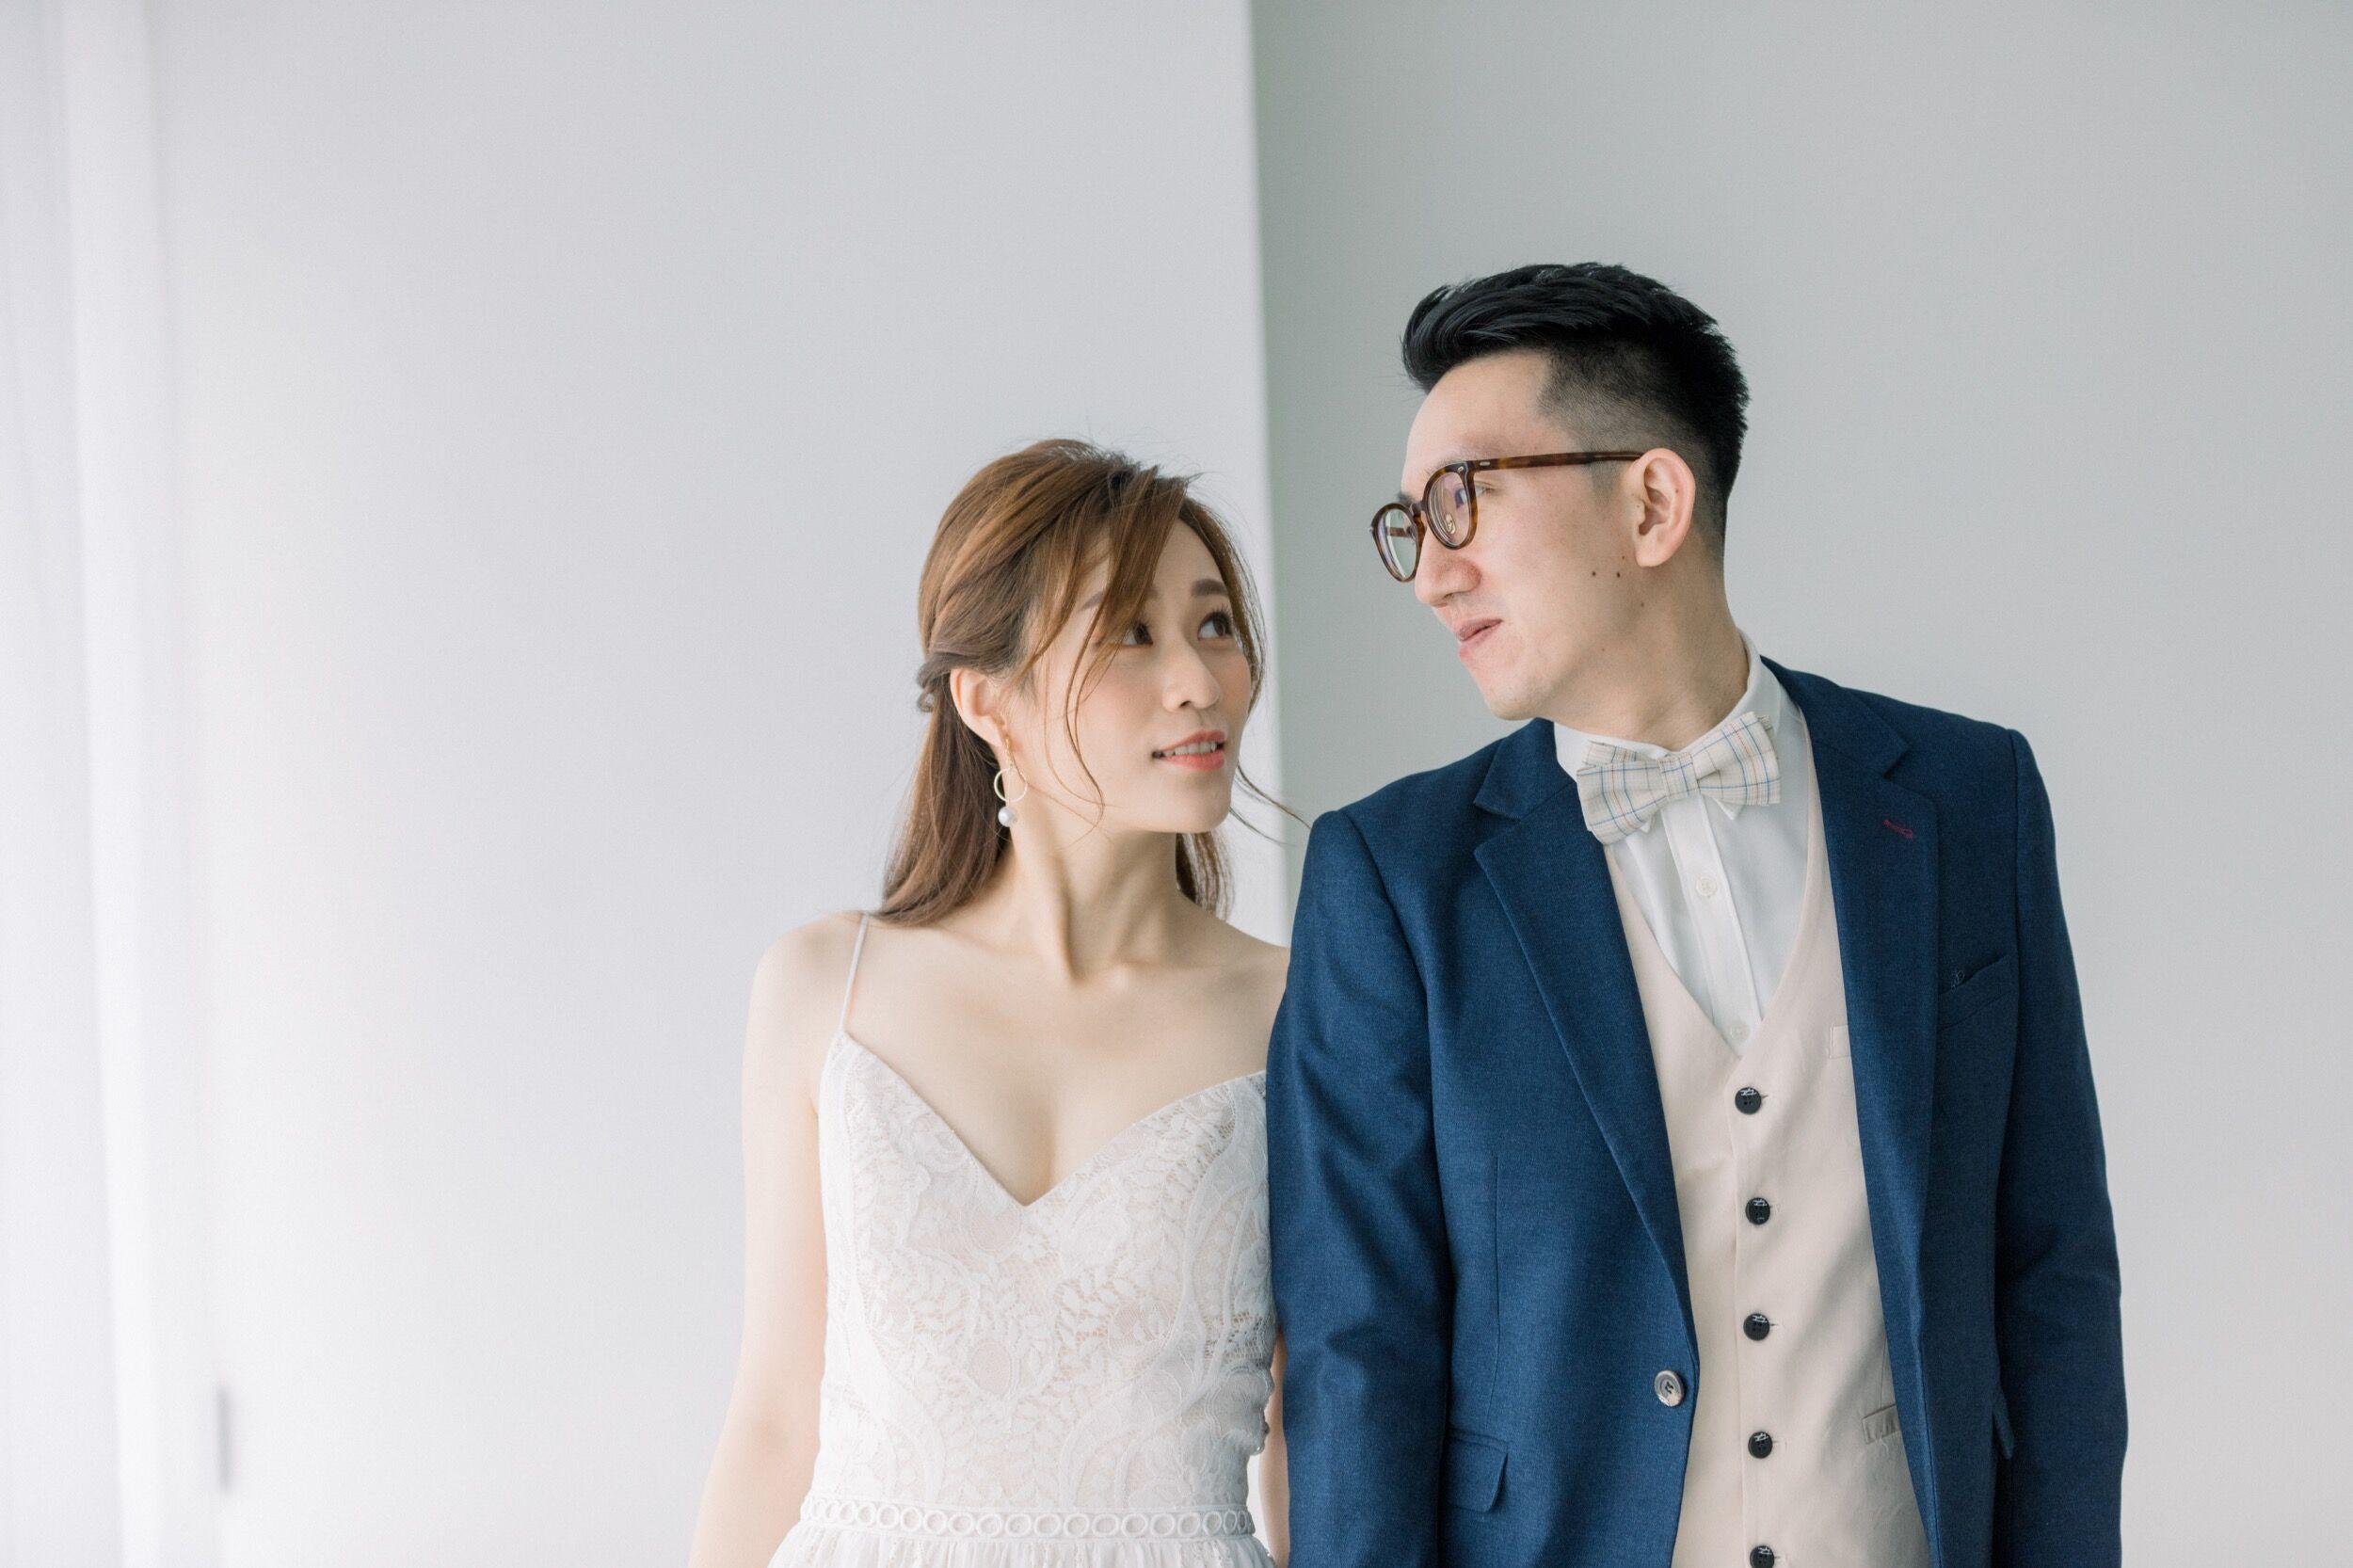 SOMETHING PERFECT!唯美溫馨小型婚禮